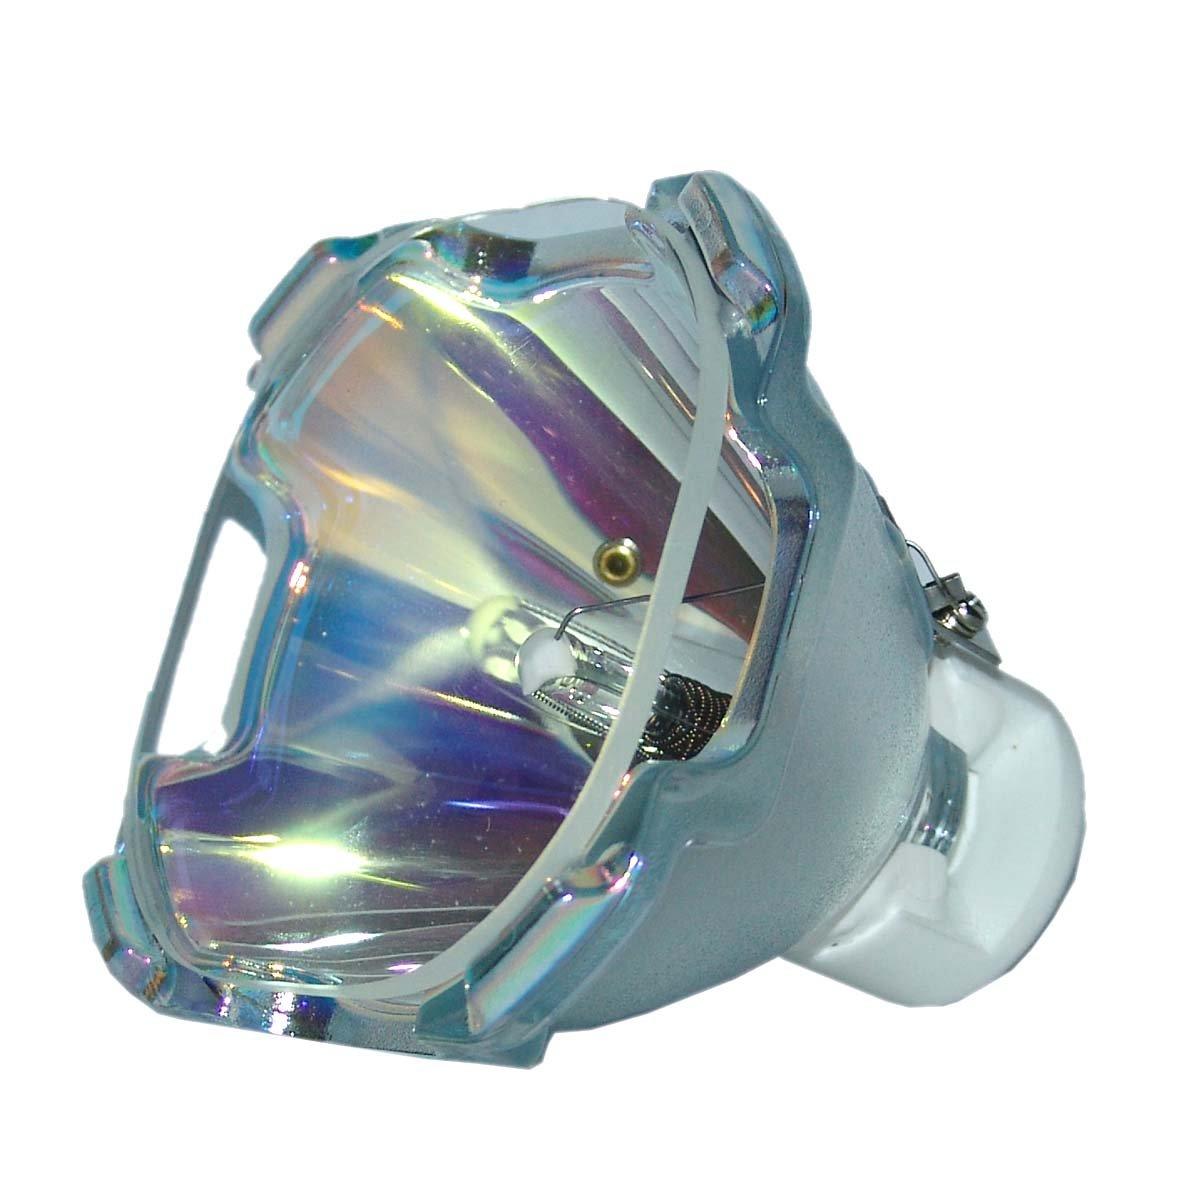 Lutema 交換用ランプ ハウジング/電球付き スタジオ体験用 POA-LMP28 Economy B07KTLK8HK Lamp Only Economy